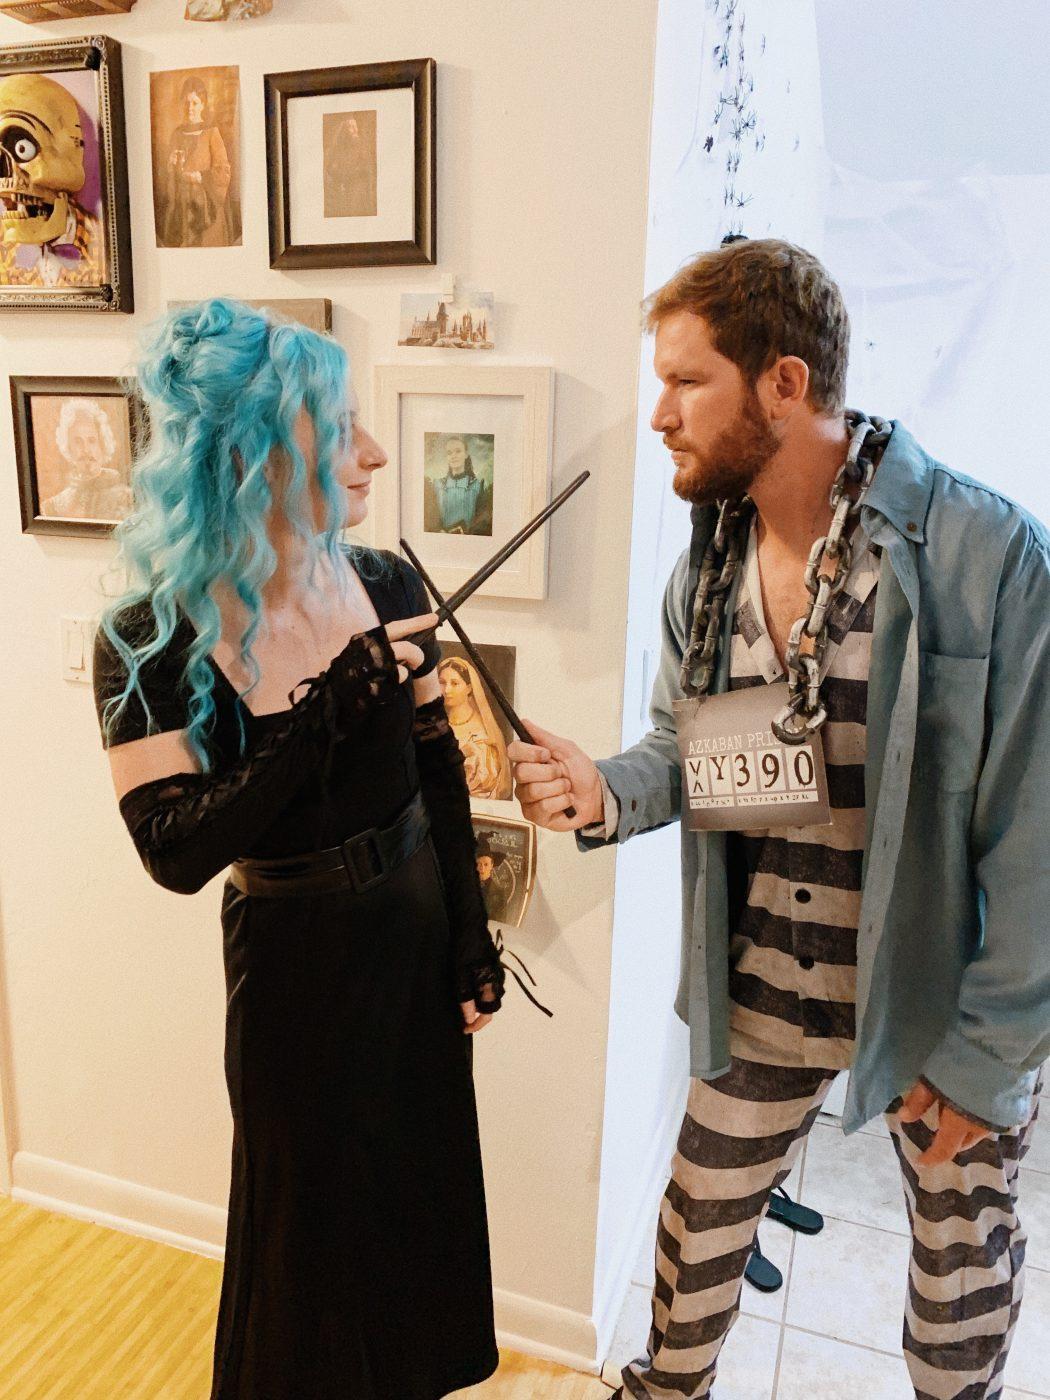 Sirius Black and Bellatrix Lestrange costume ideas